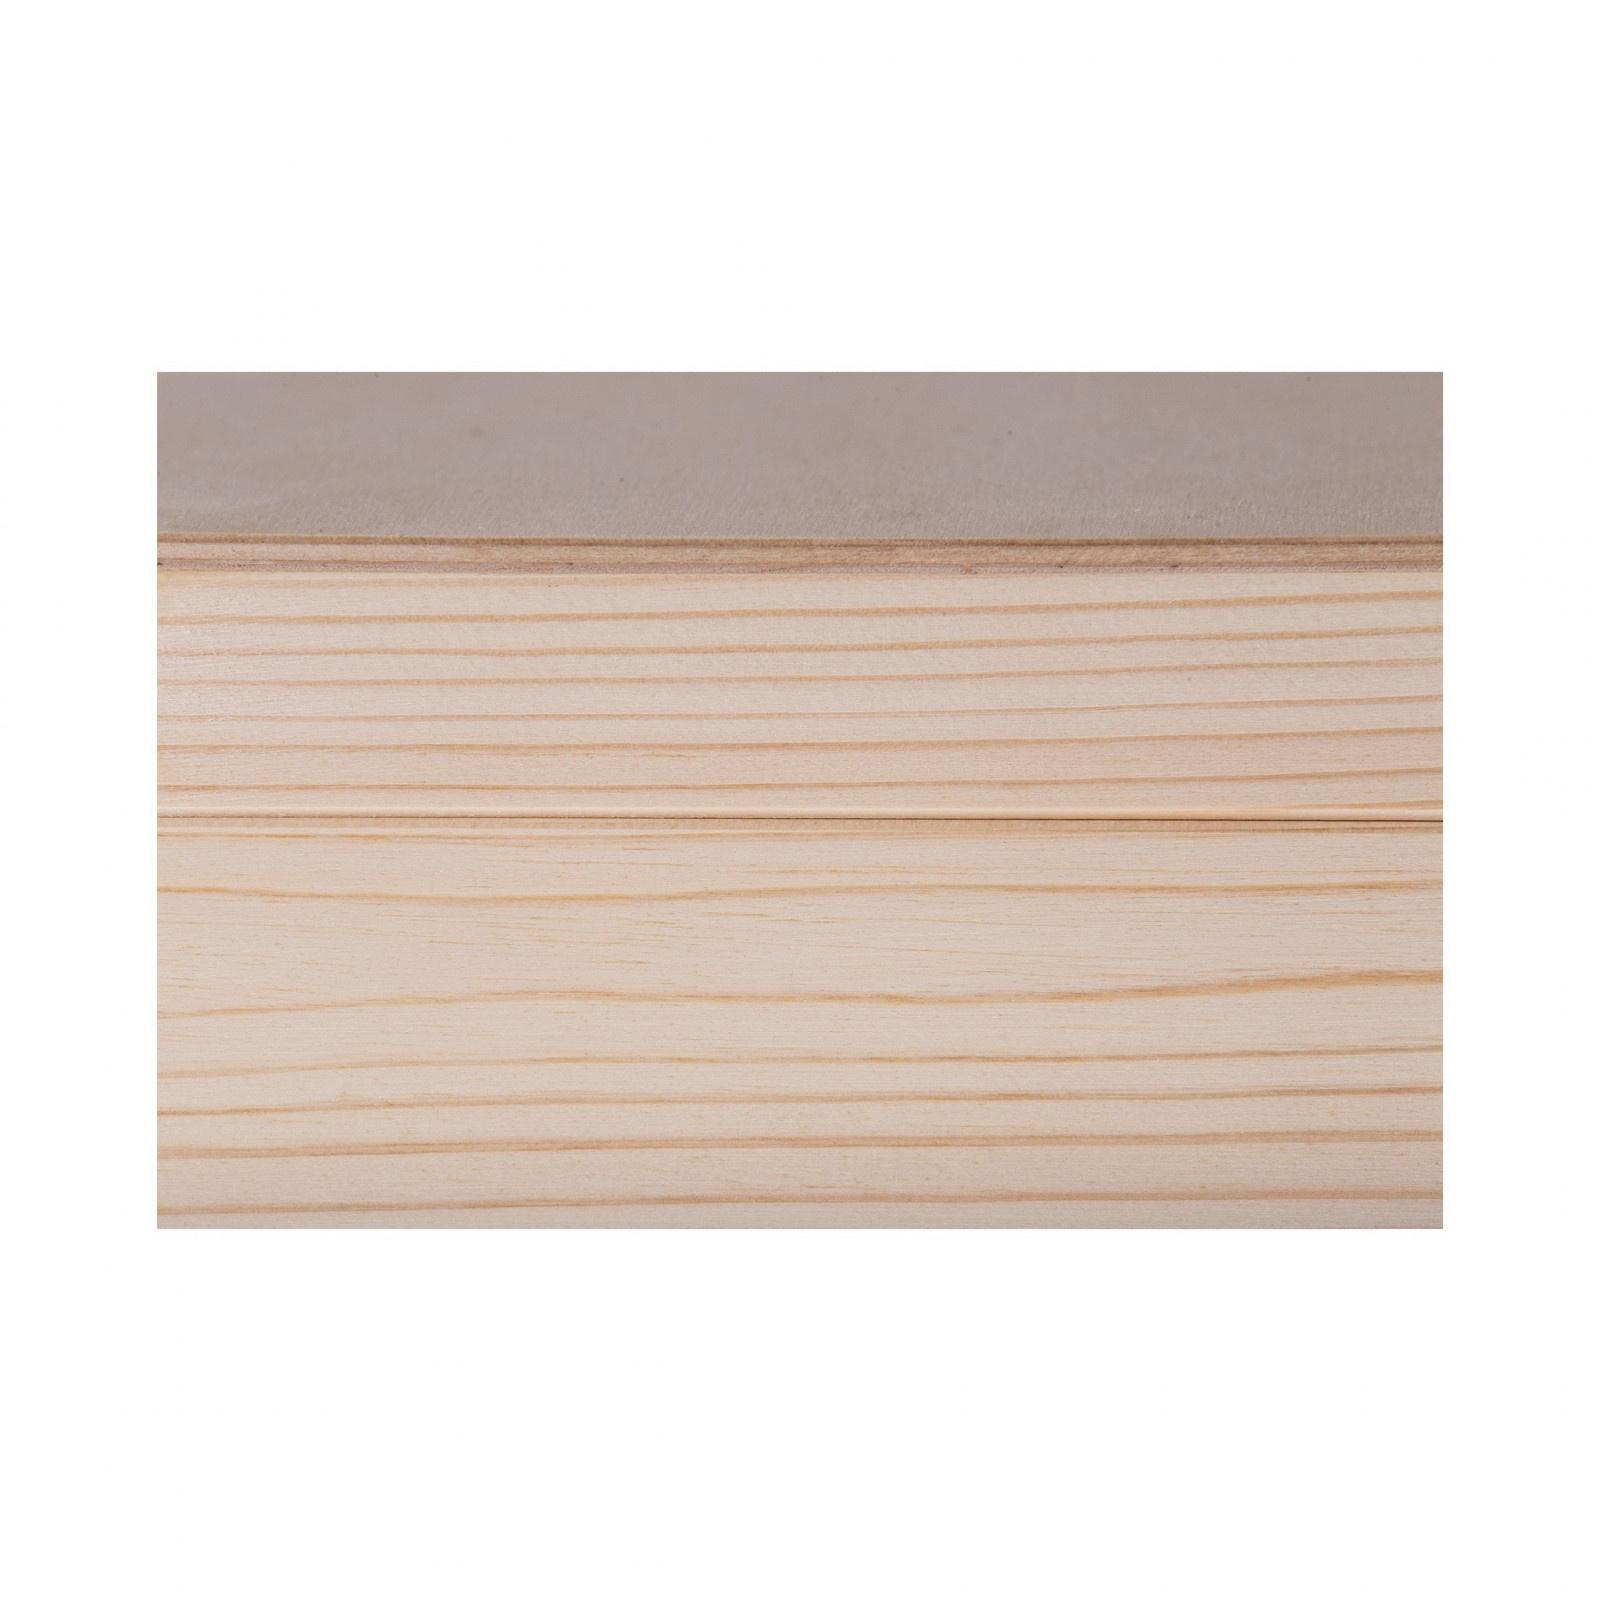 Drevená krabička s 8 priehradkami 16x28x8cm borovica megamix.sk